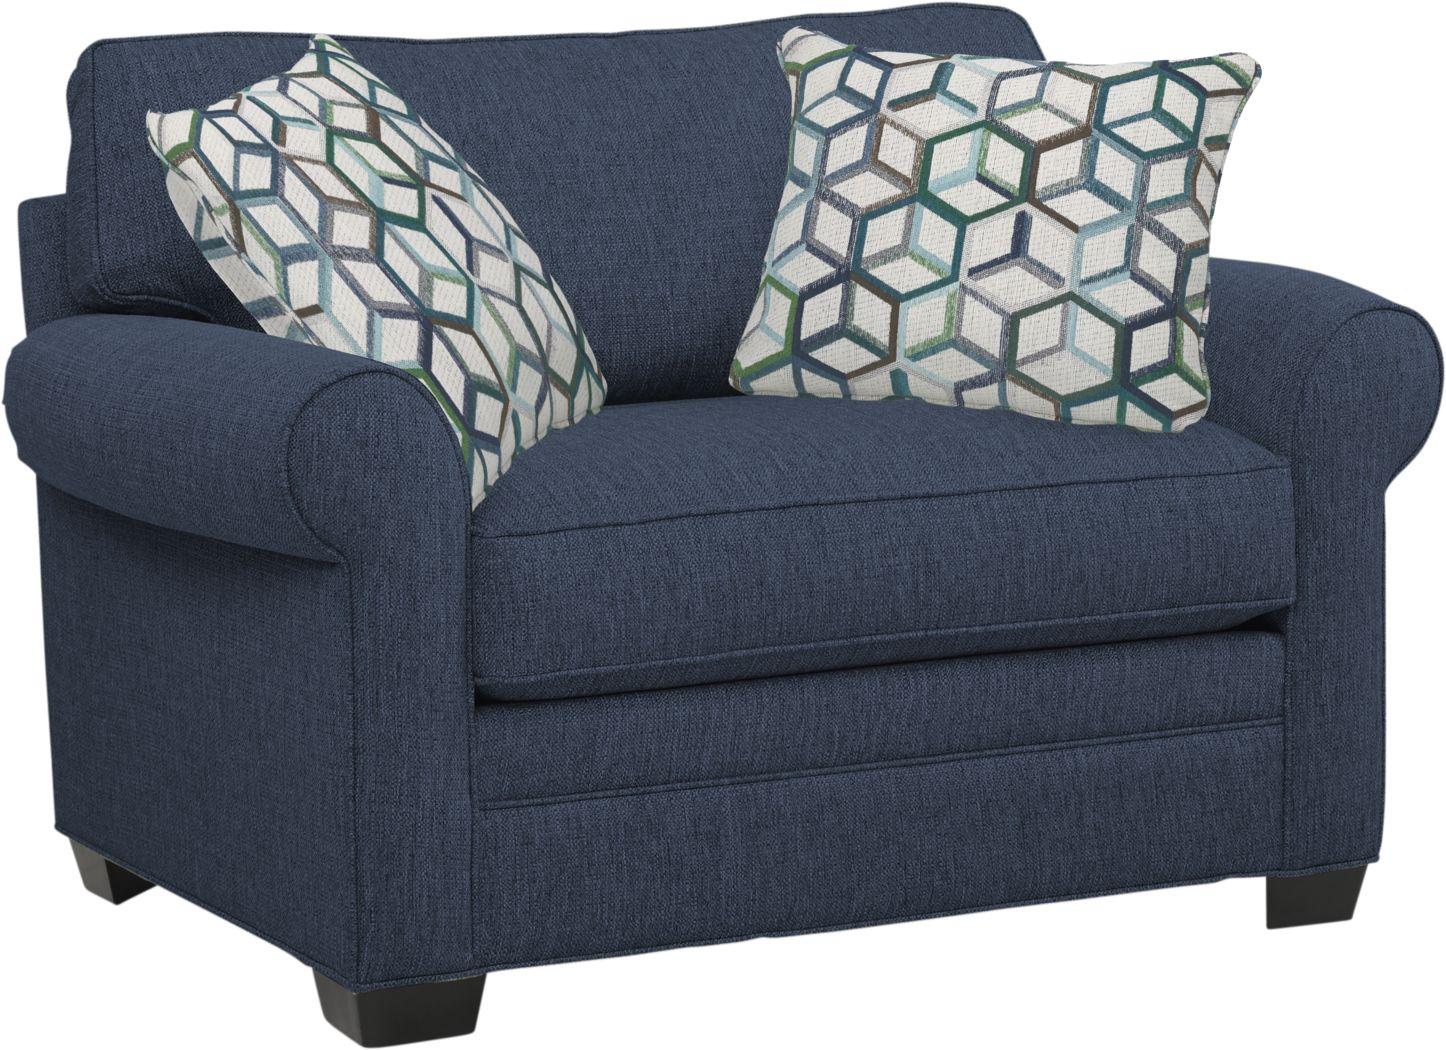 Cindy Crawford Home Bellingham Midnight Textured Sleeper Chair